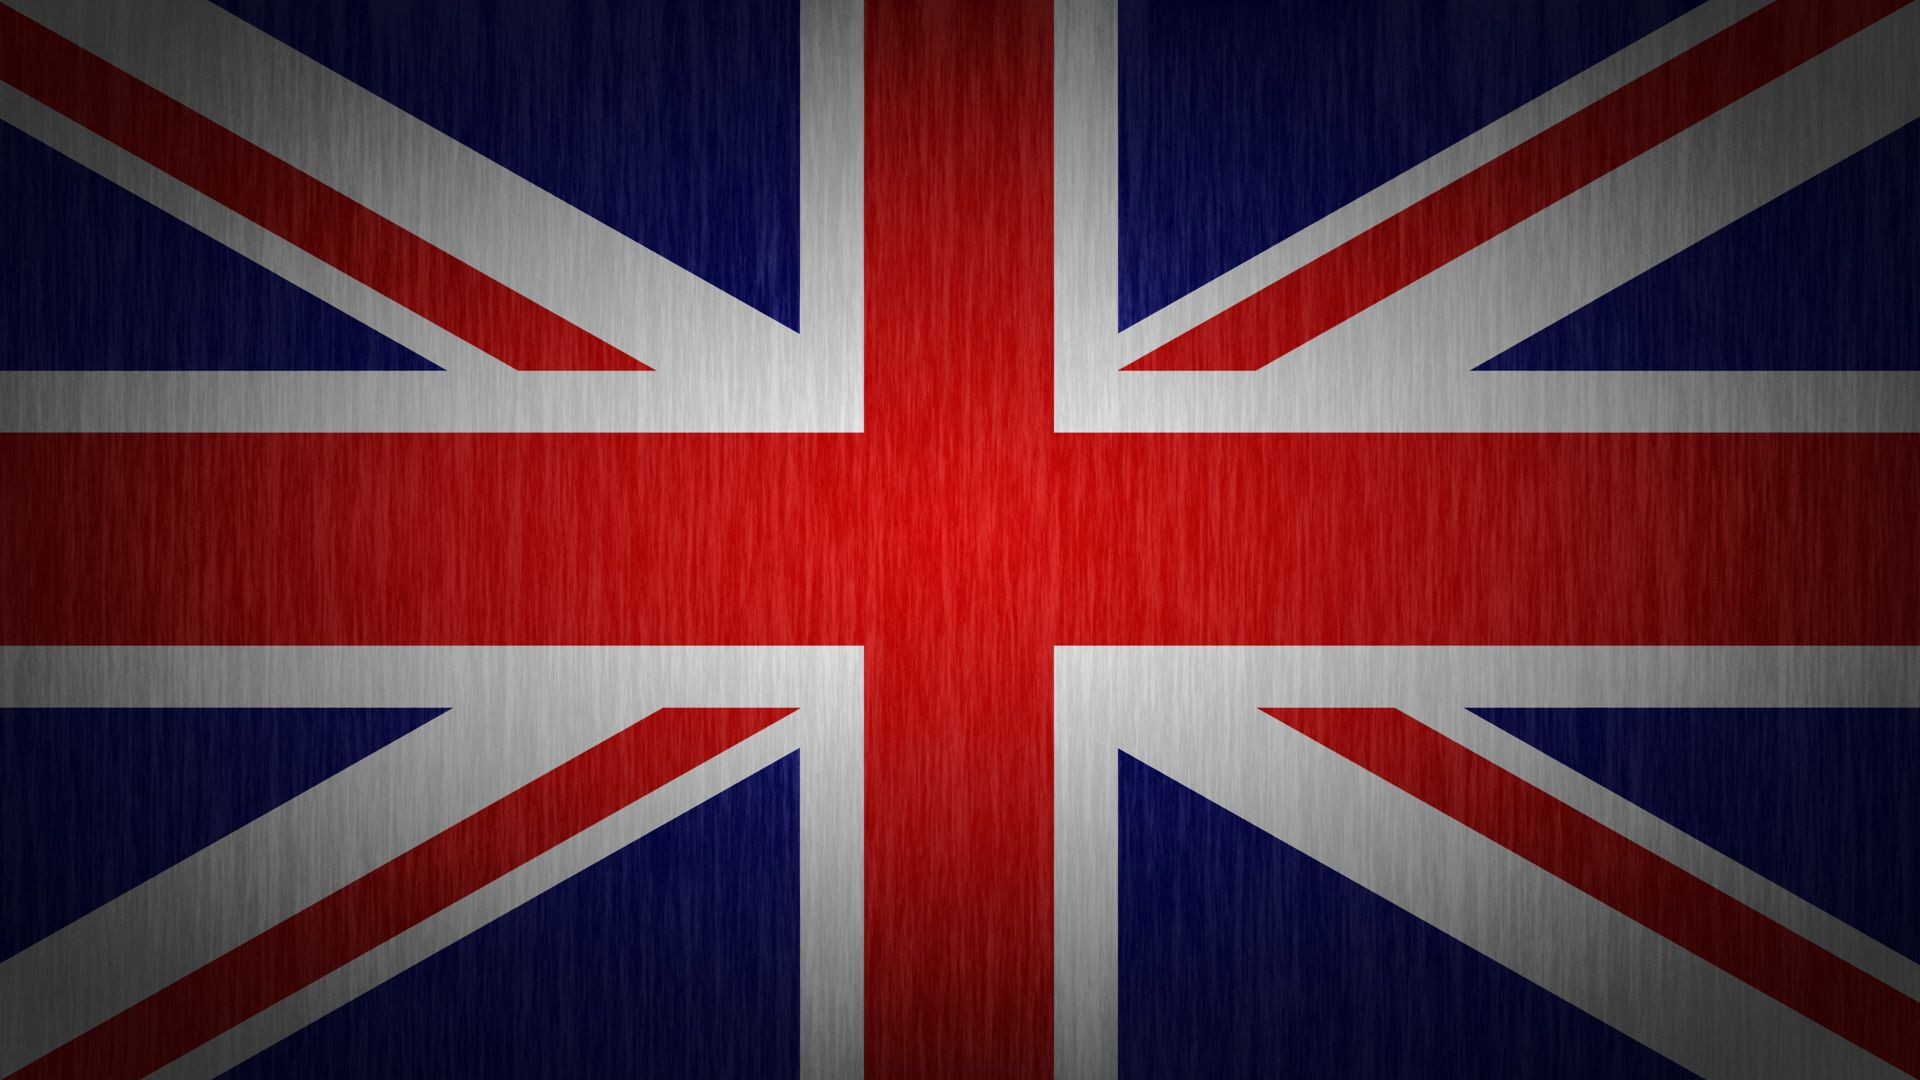 British United Kingdom Flag Hd Wallpaper Hd 1080p 1080p